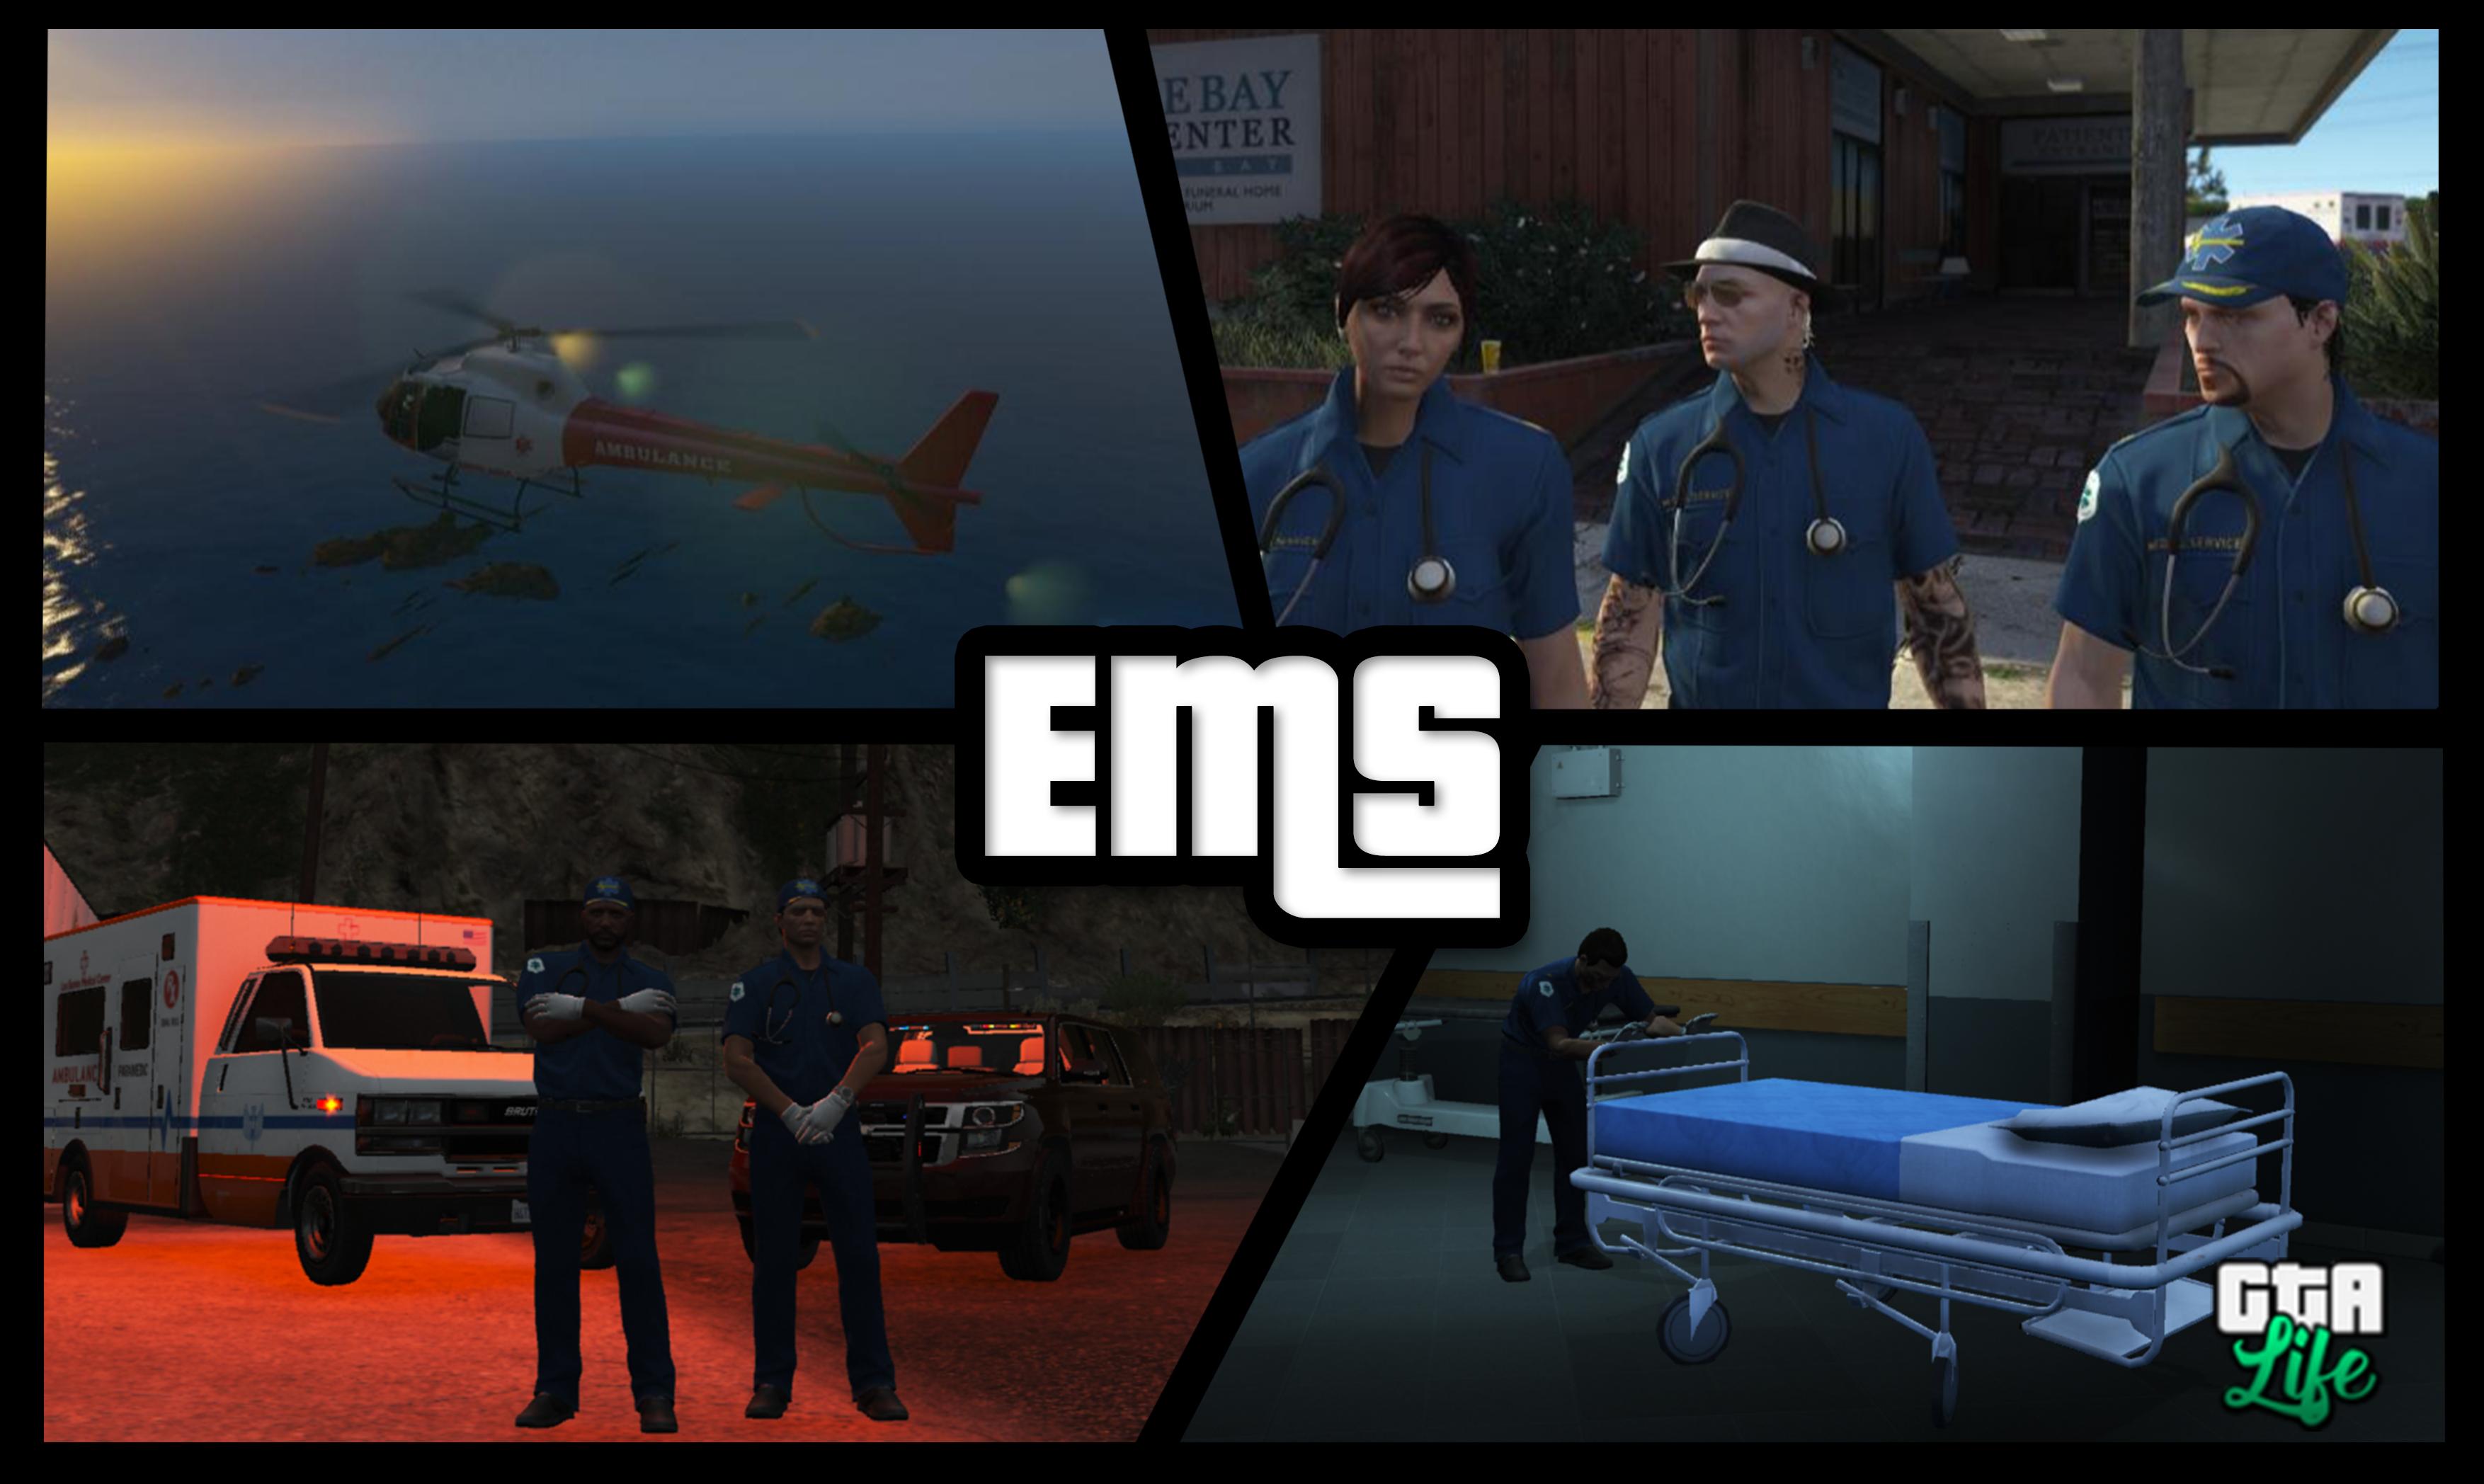 5b72ae4052569-EMS.png